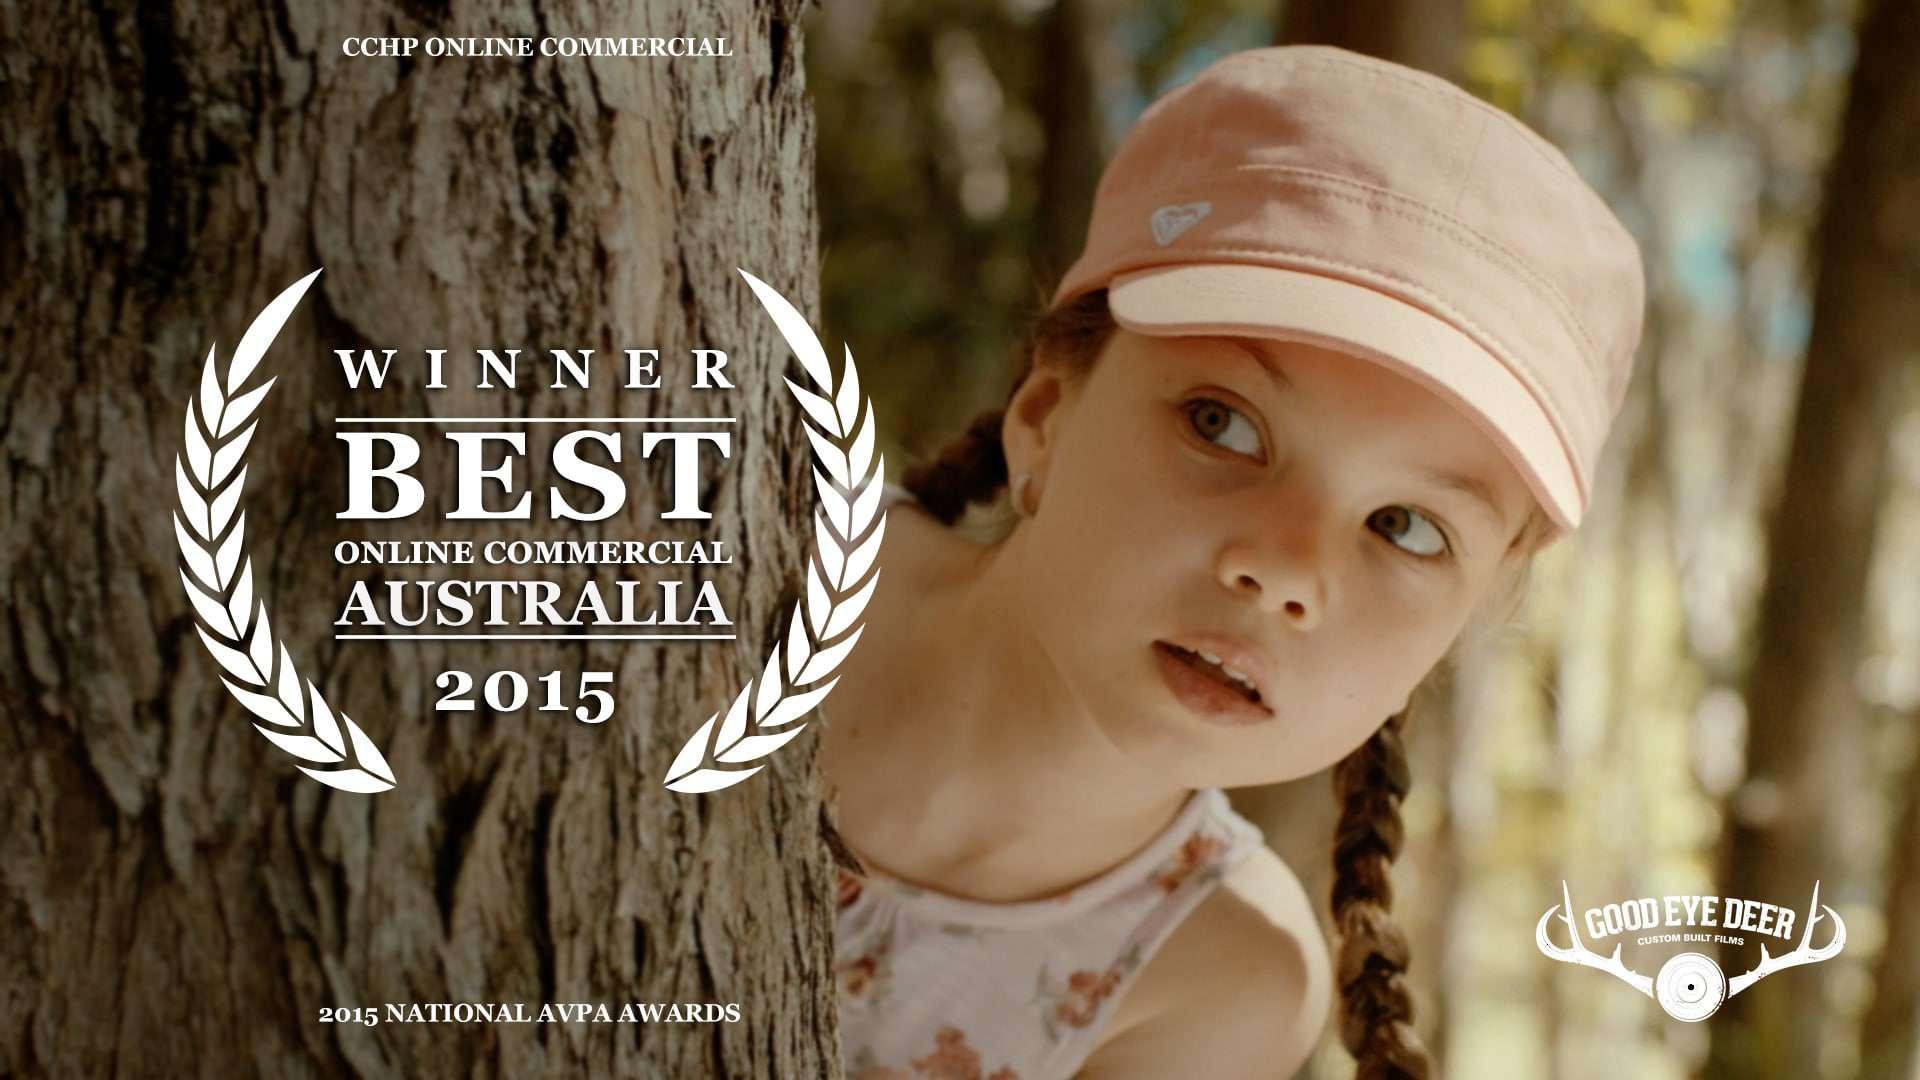 Award Winning Professional Sydney Video Production Company